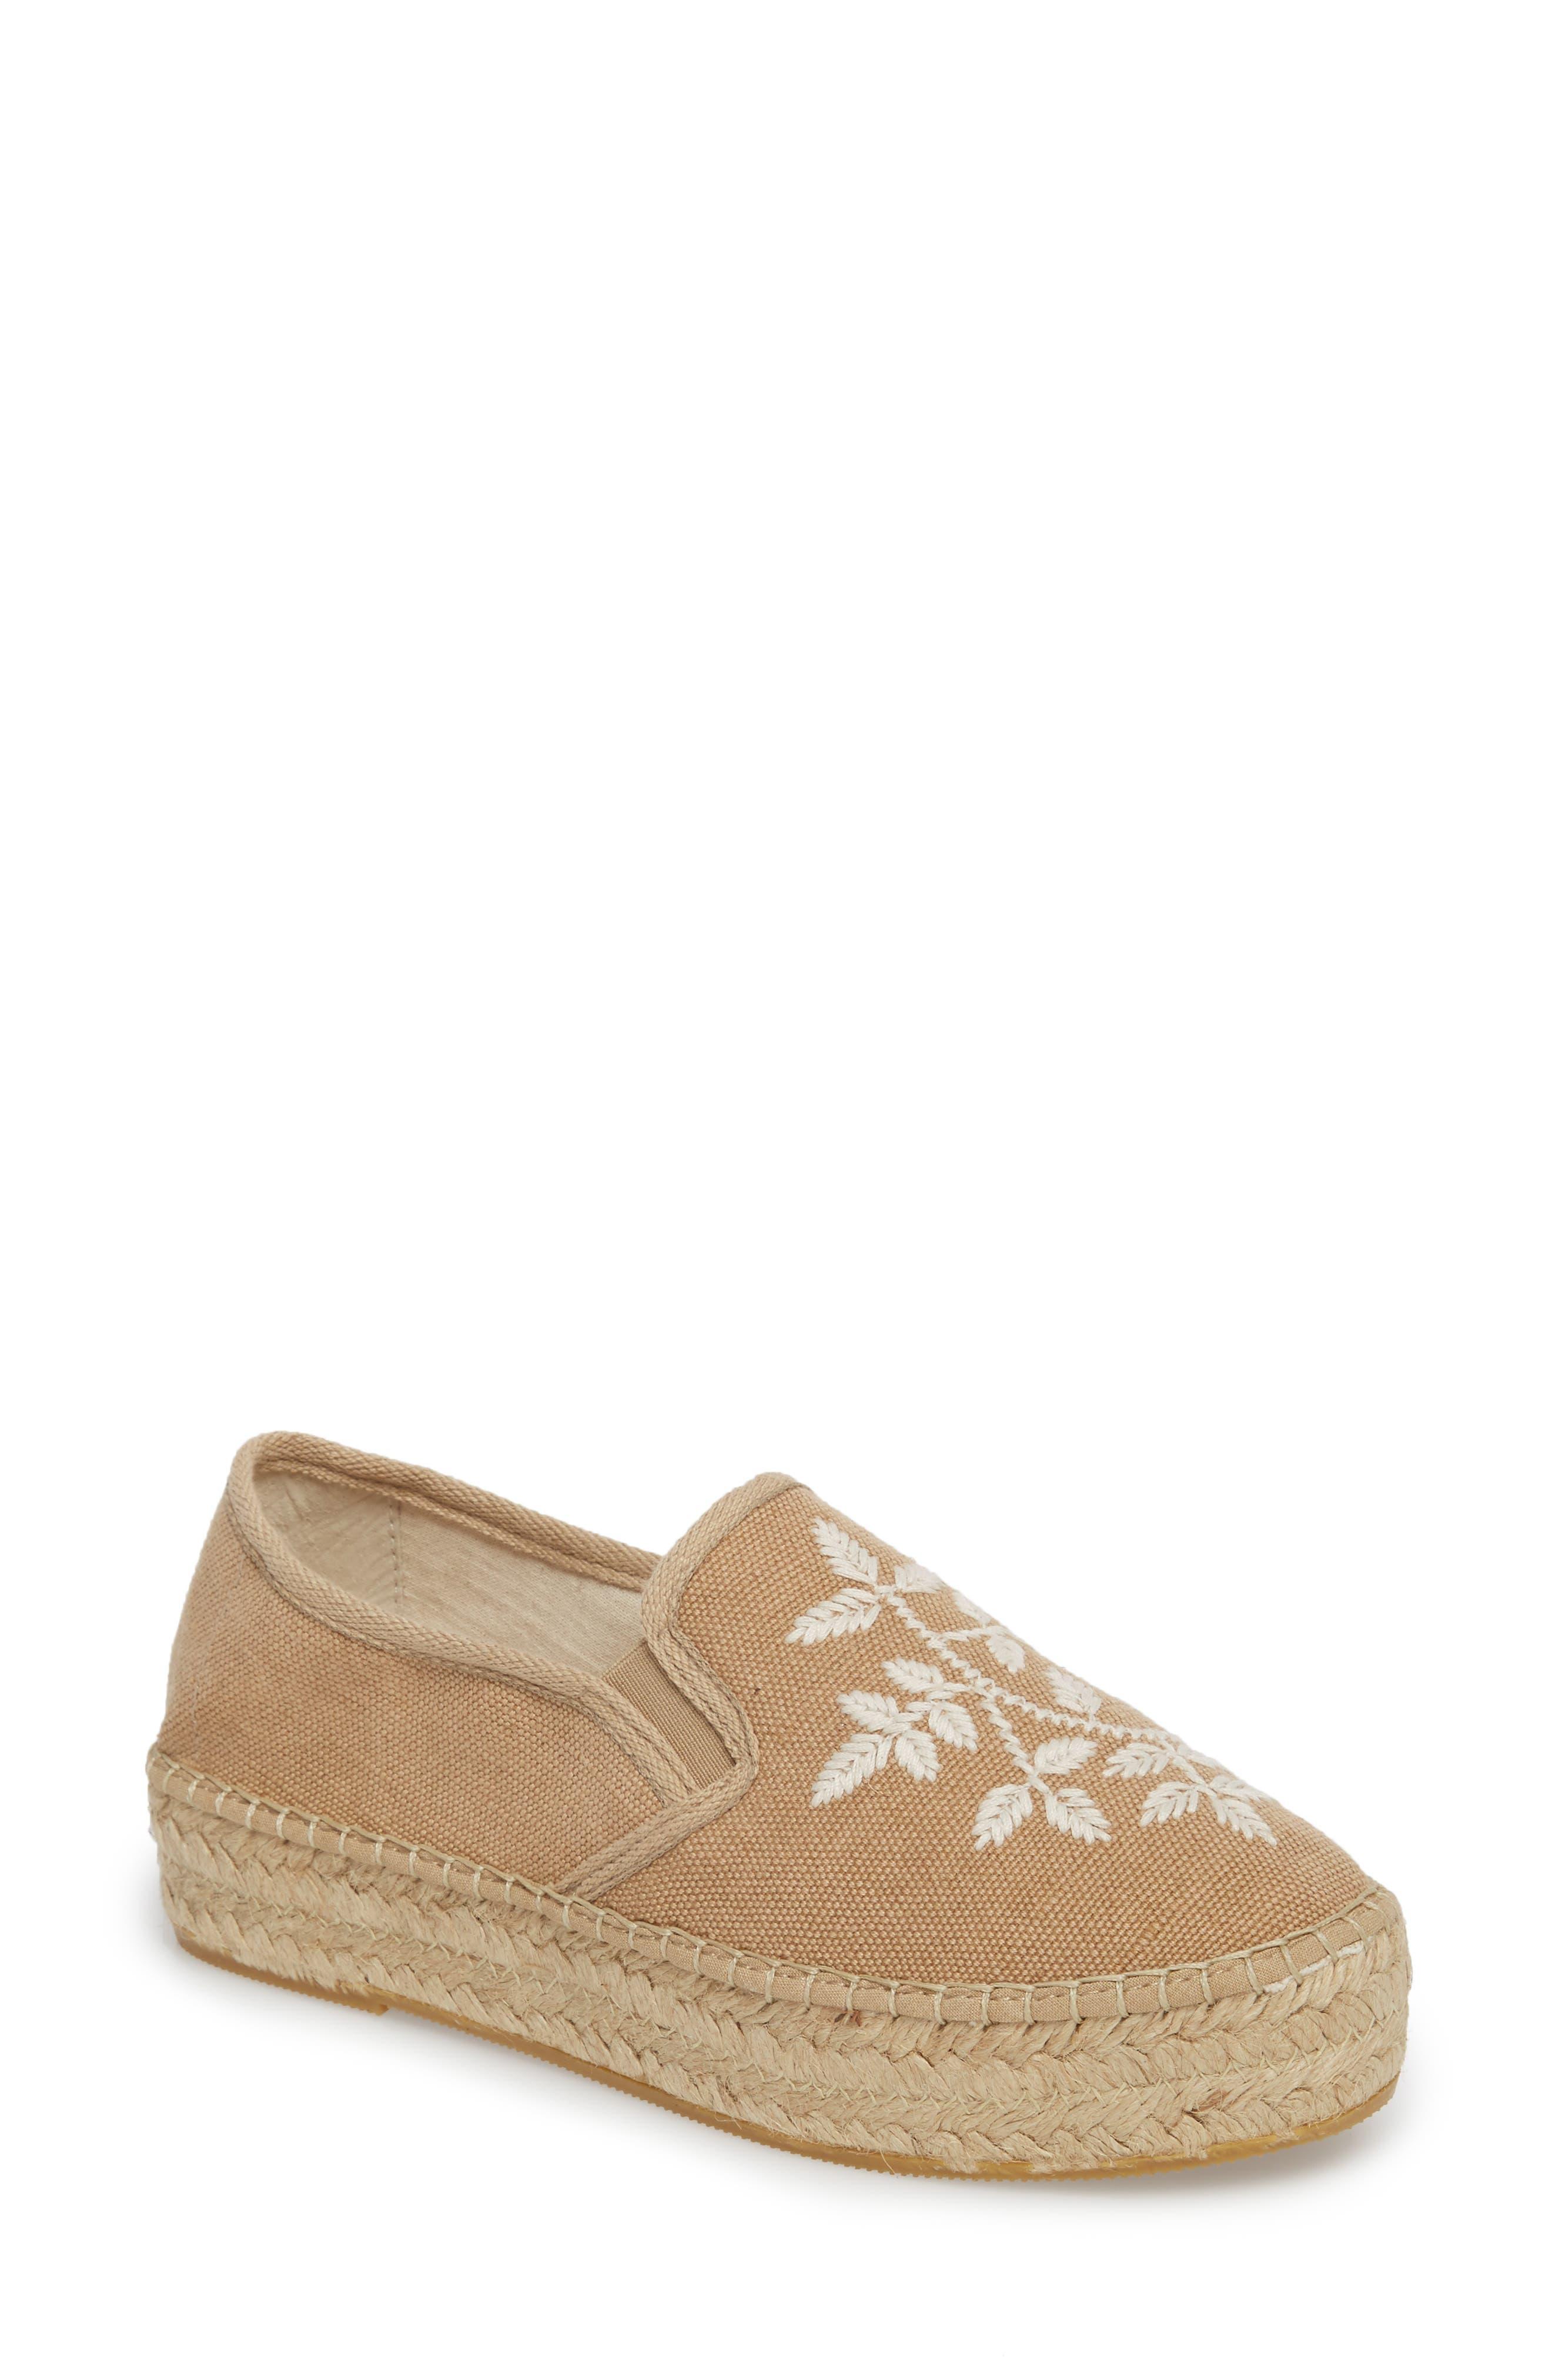 Toni Pons Florence Embroidered Platform Espadrille Sneaker Brown